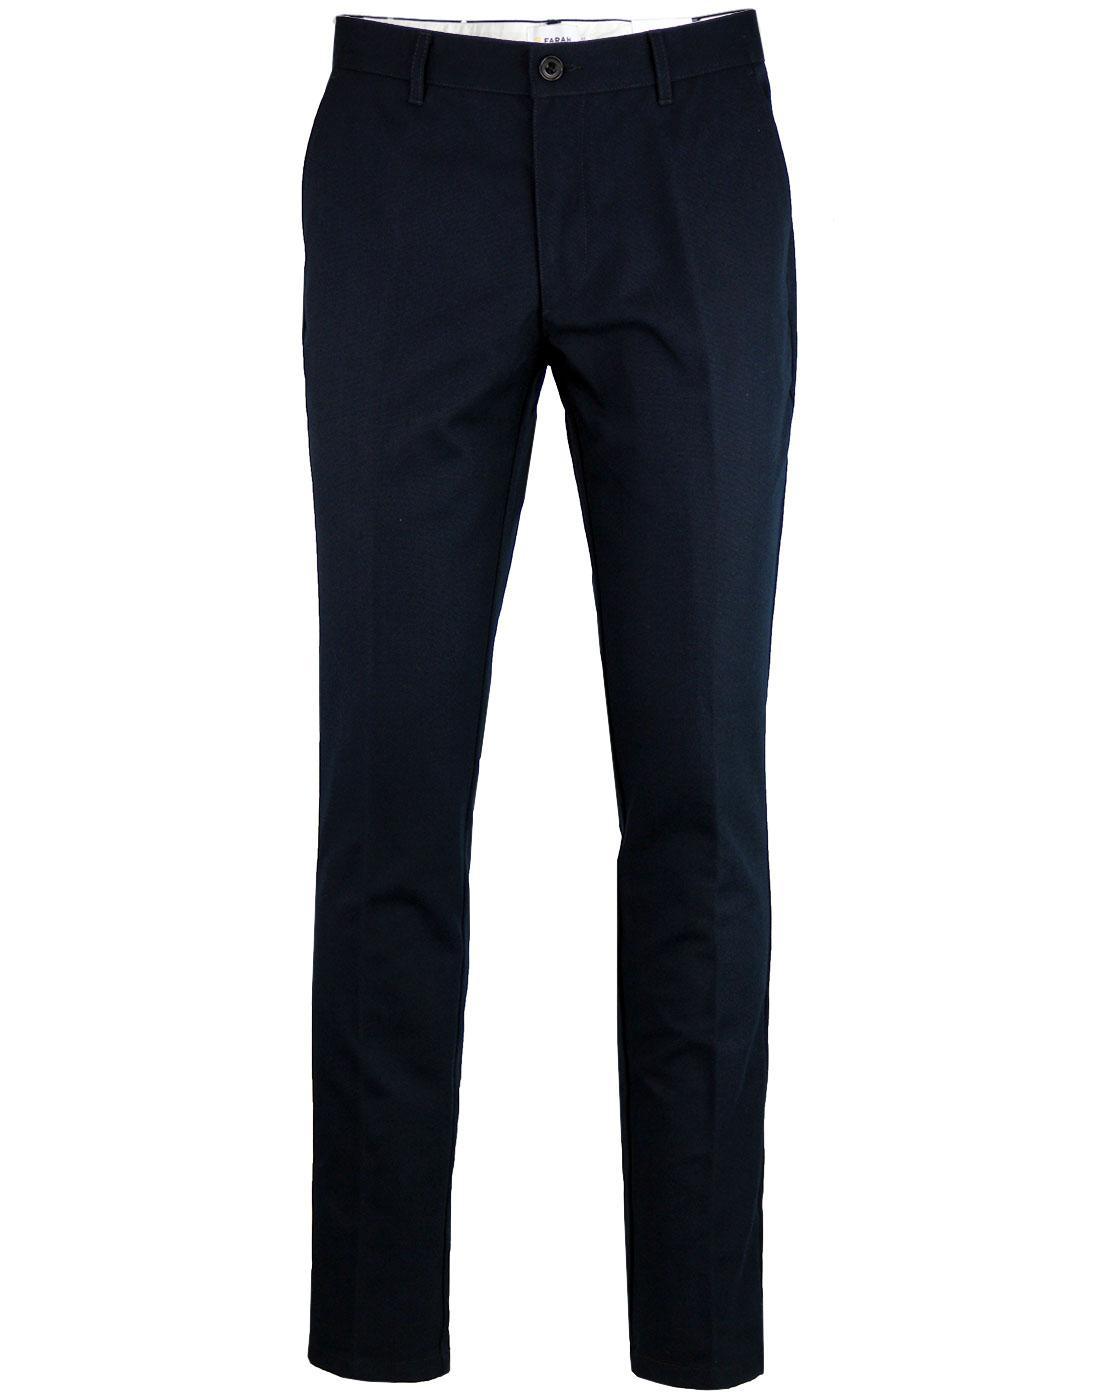 Elm FARAH Men's 60s Mod Slim Hopsack Trousers TN